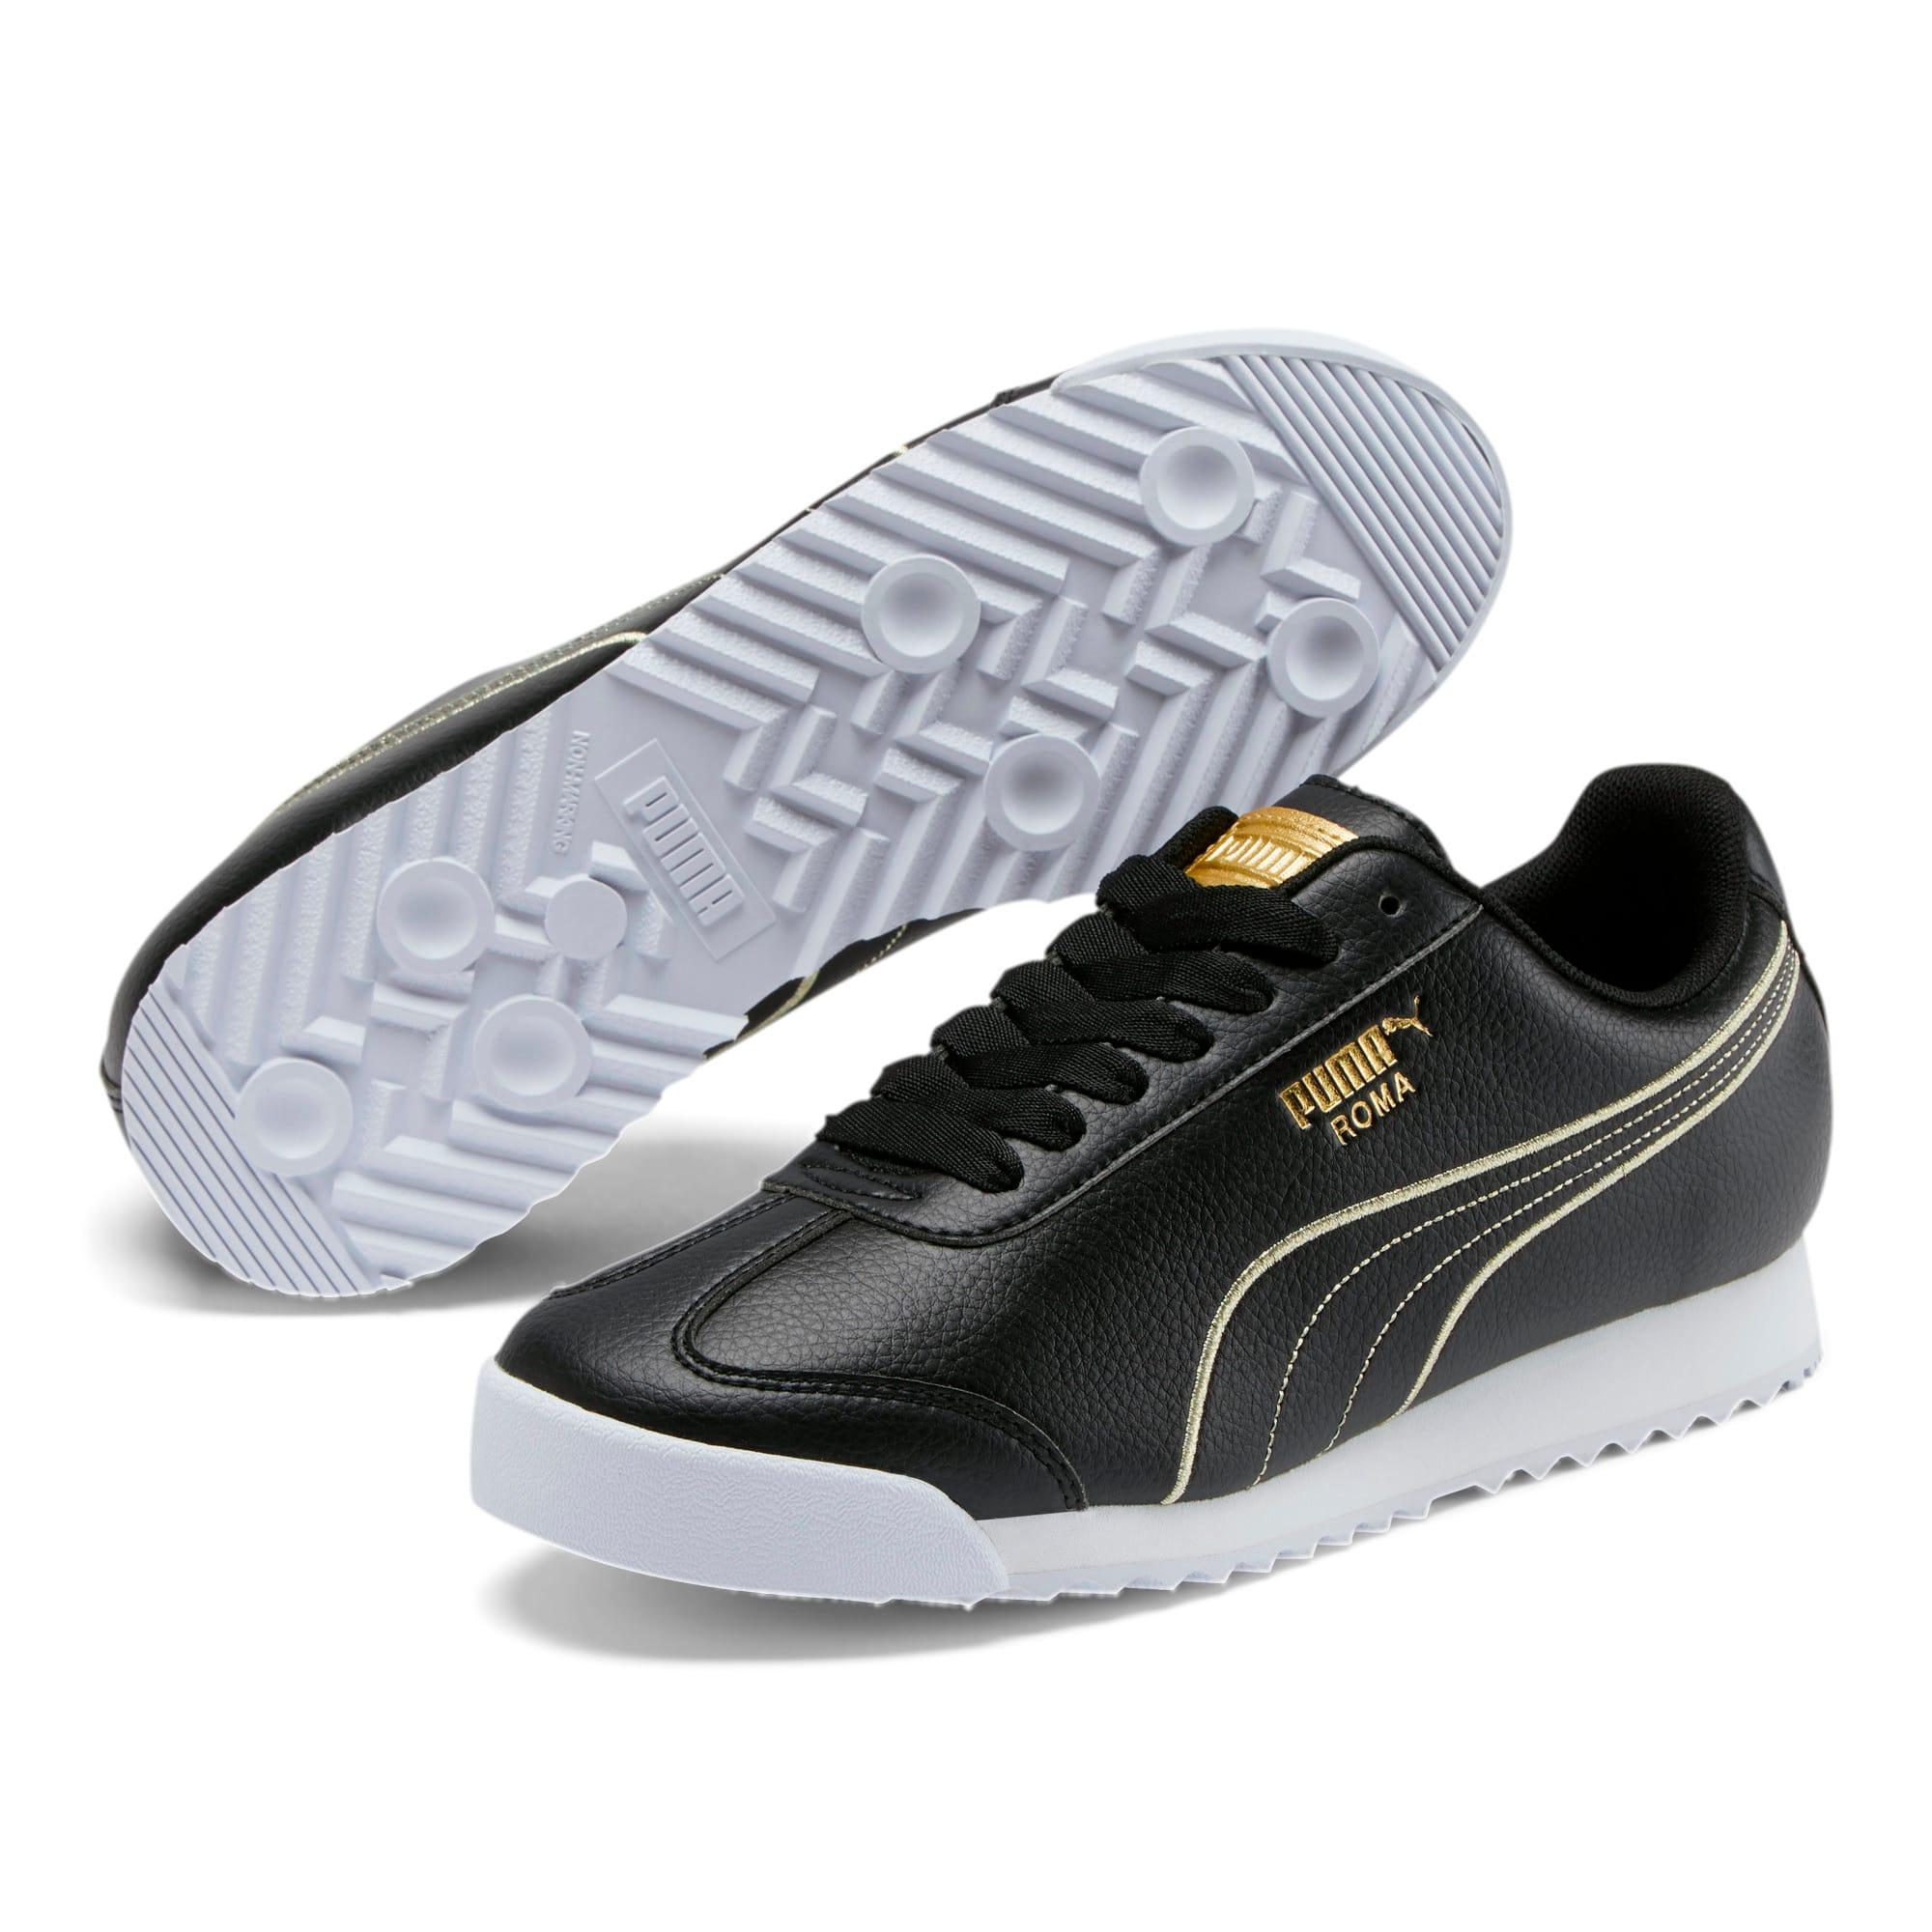 Thumbnail 2 of Roma Metallic Stitch Women's Sneakers, Puma Black-Puma Team Gold, medium